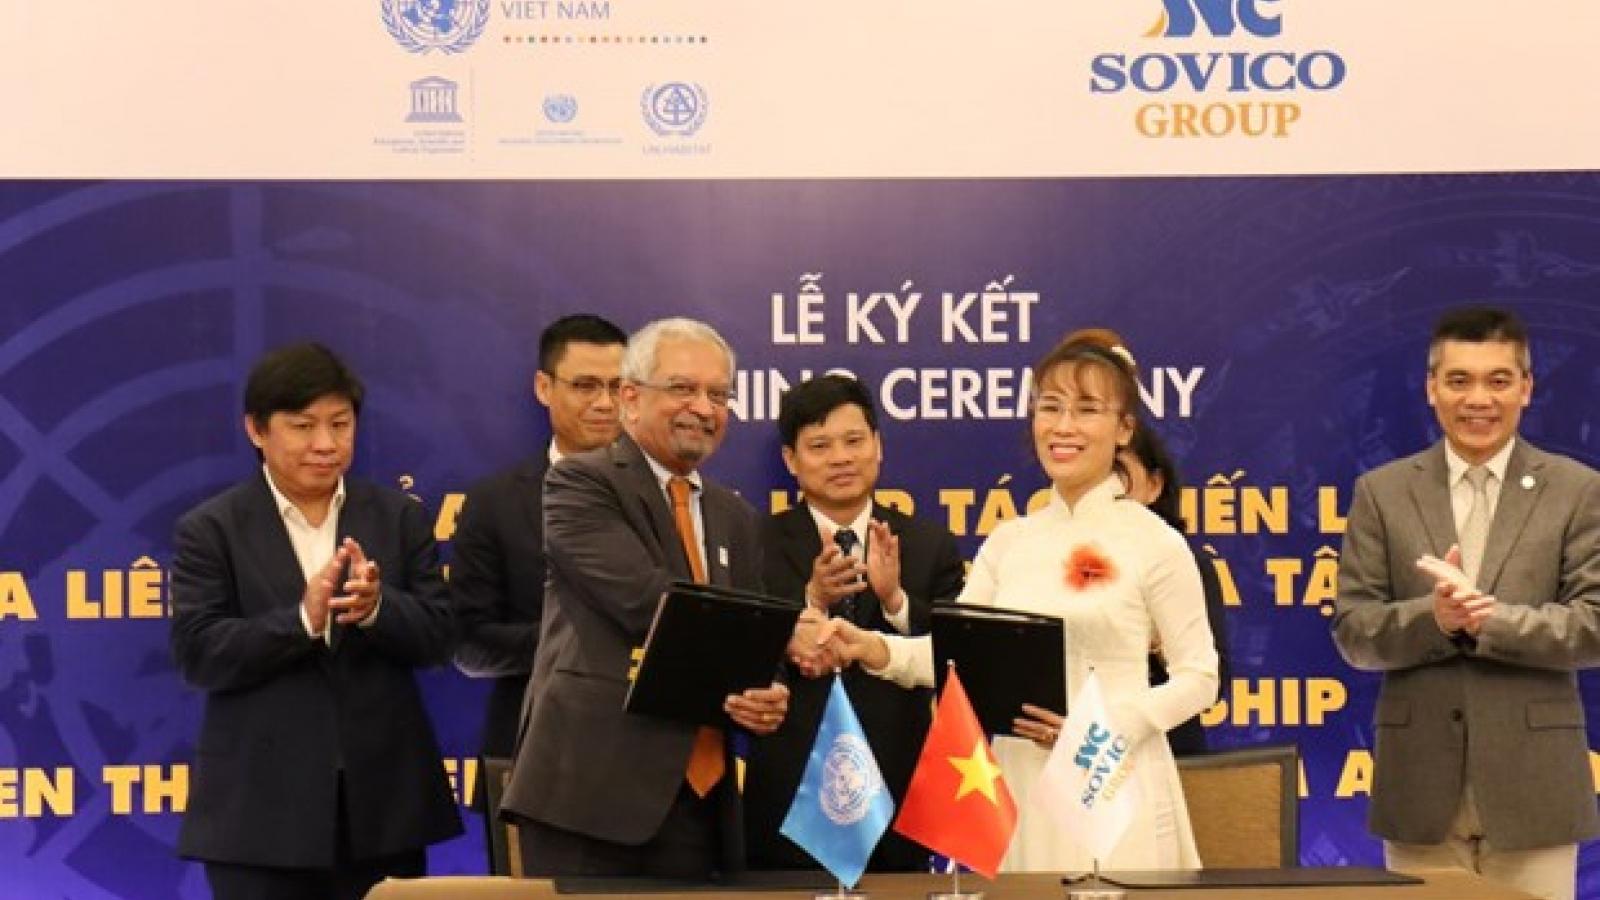 SOVICO Group becomes UN's strategic partner